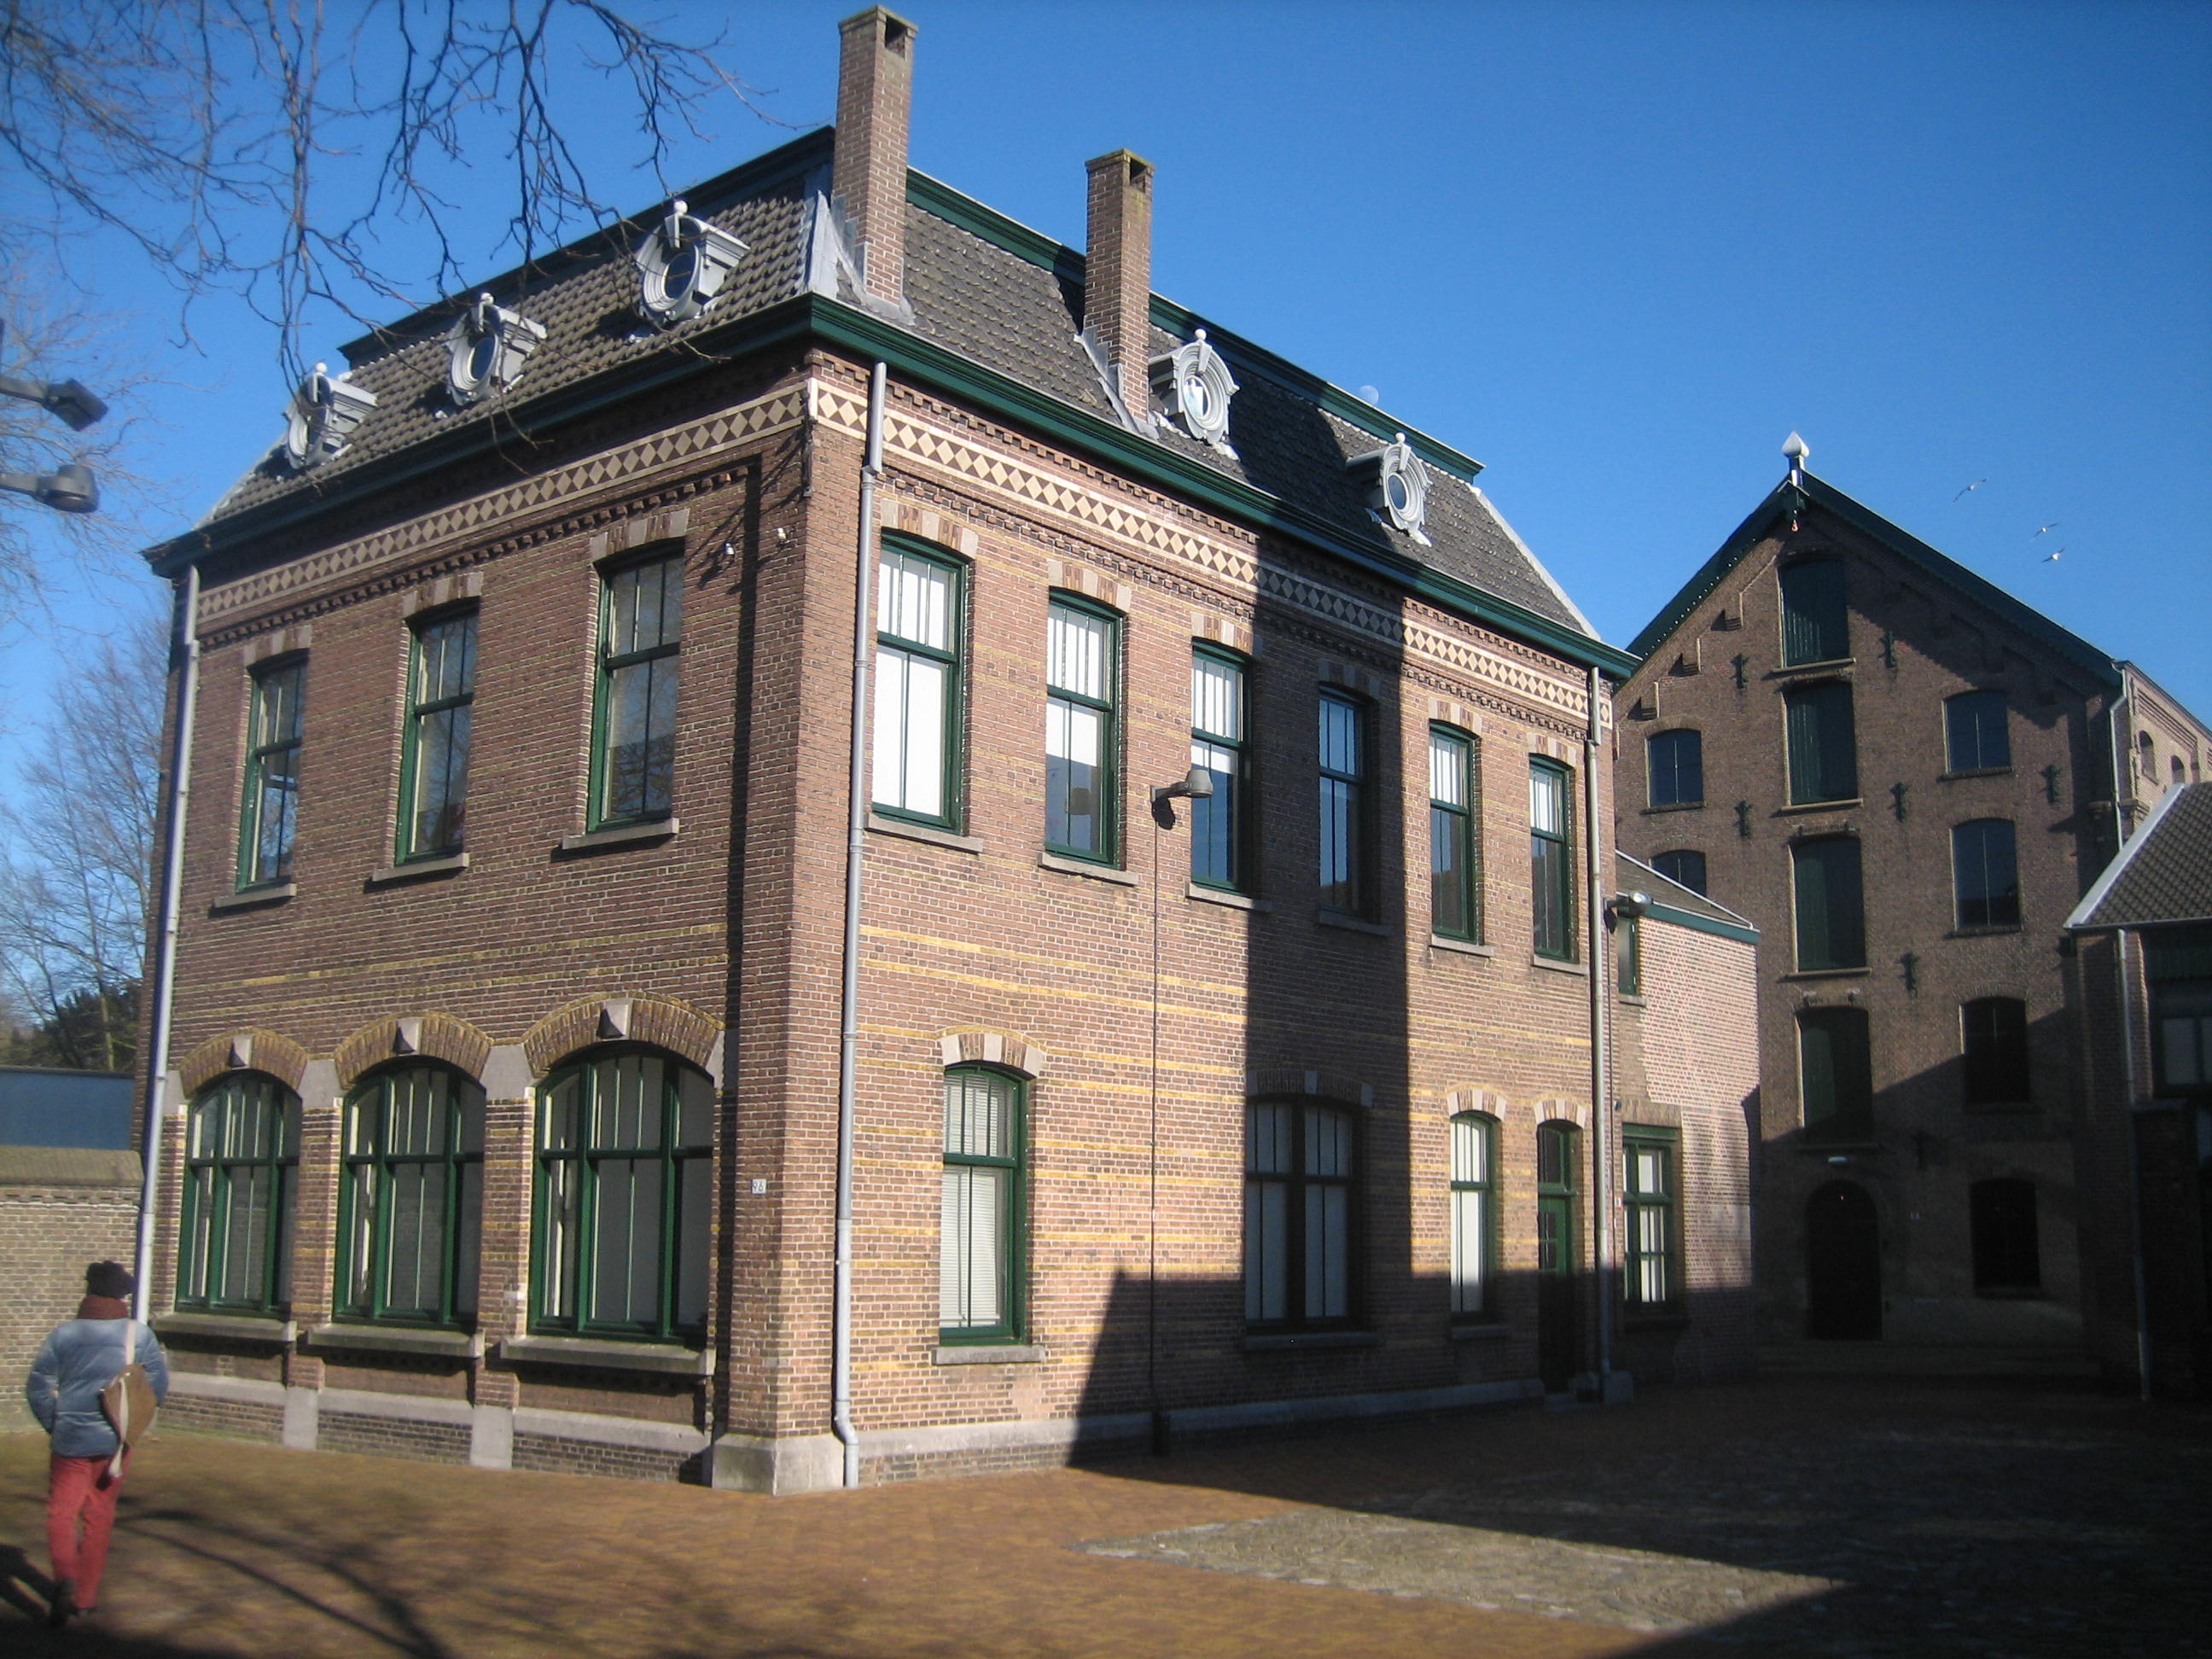 TextielMuseum Tilburg, 2018. Foto Coert Peter Krabbe, CC BY 4.0